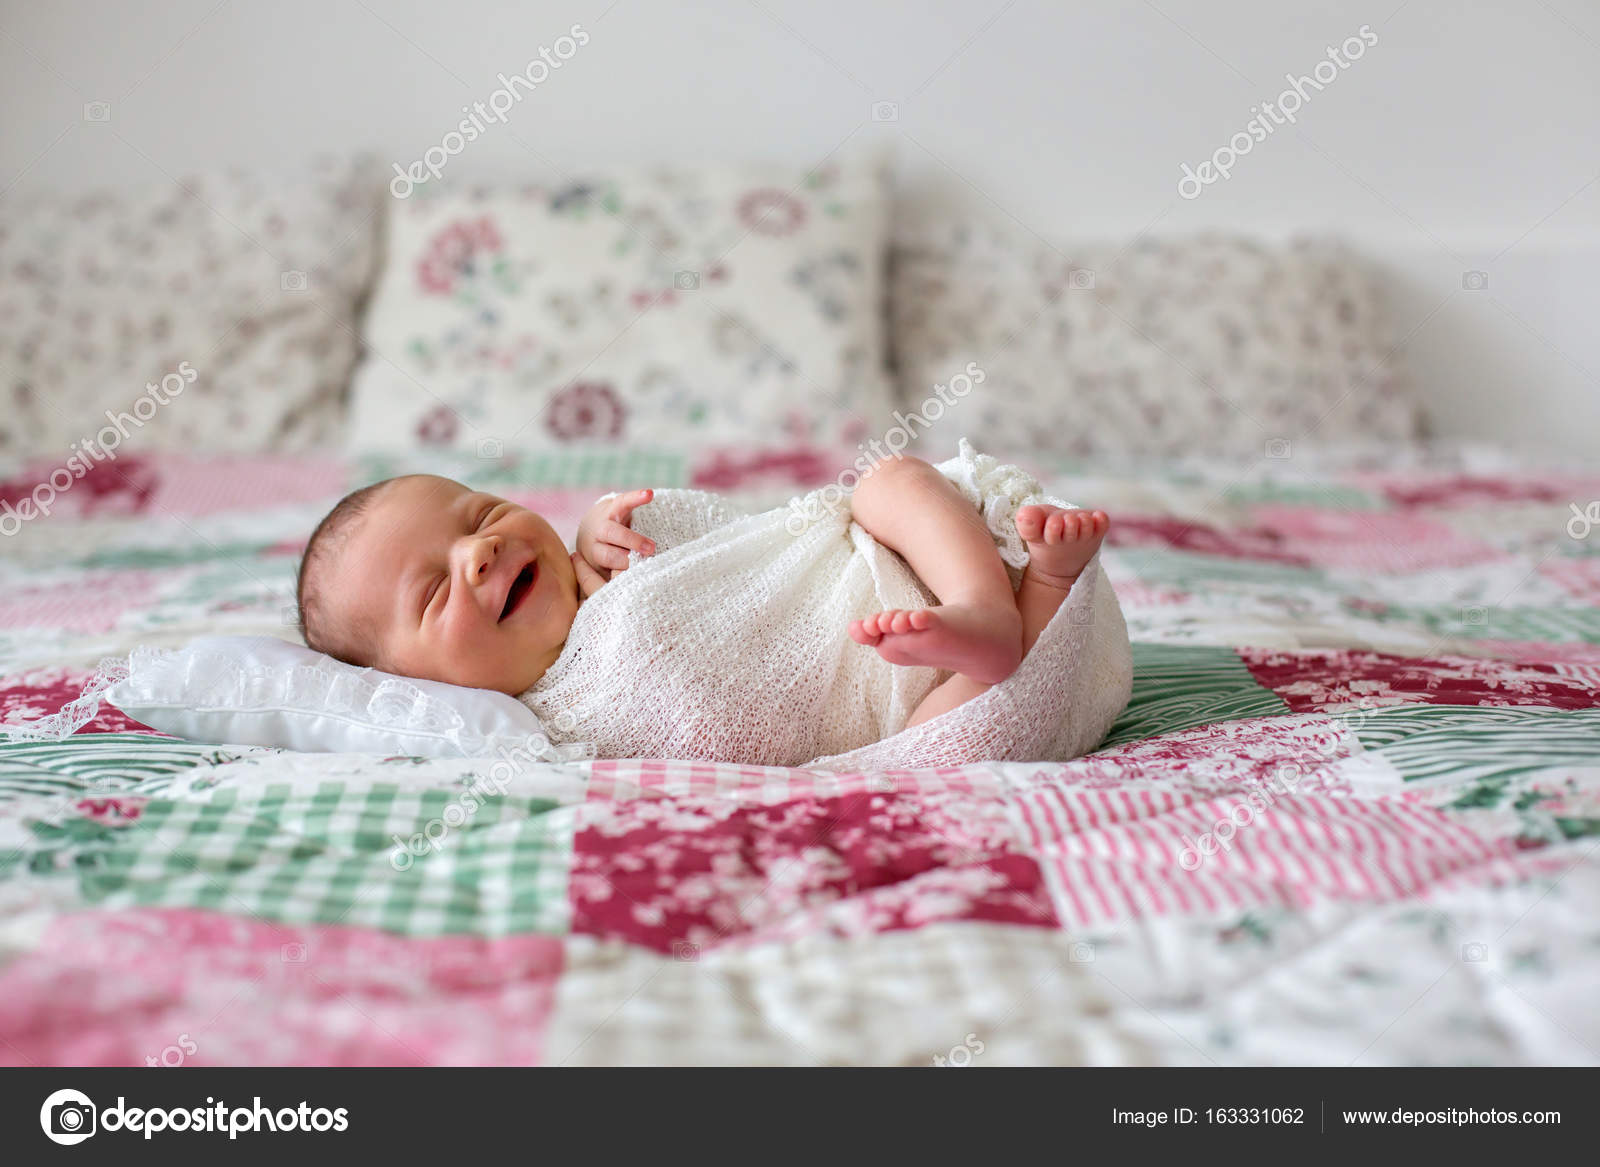 Beautiful Newborn Baby Boy Widely Smiling Wrapped In Wrap Lyi